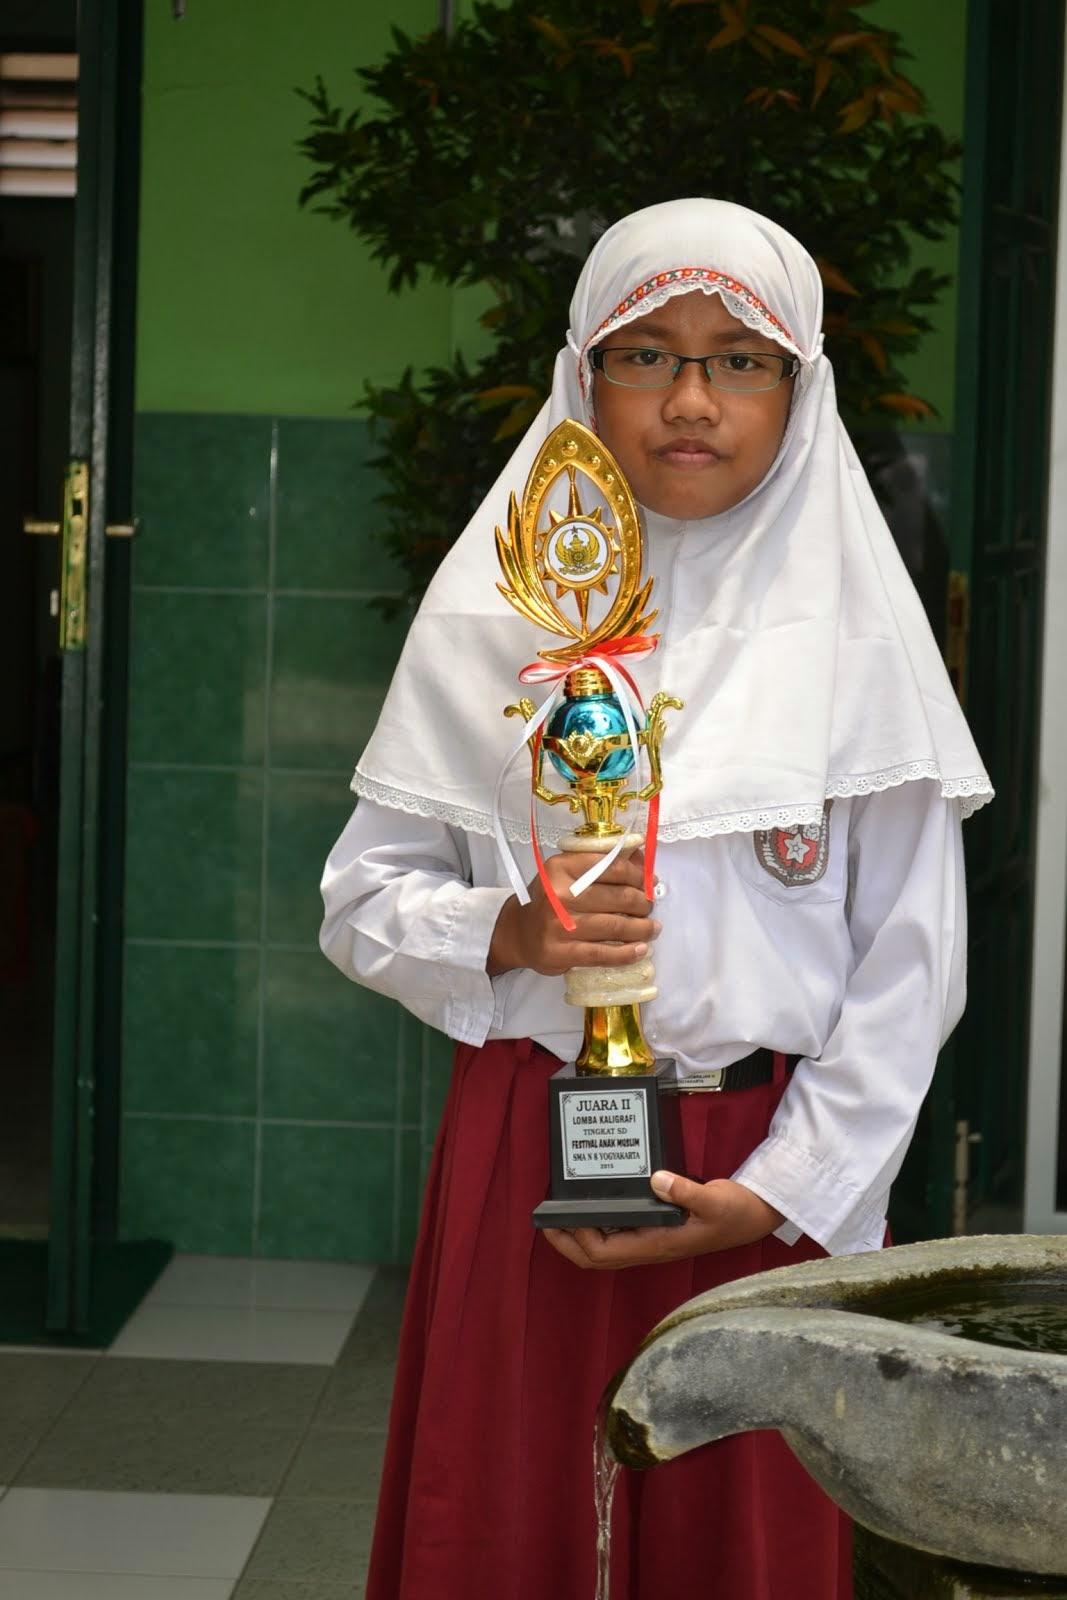 Juara Kaligrafi